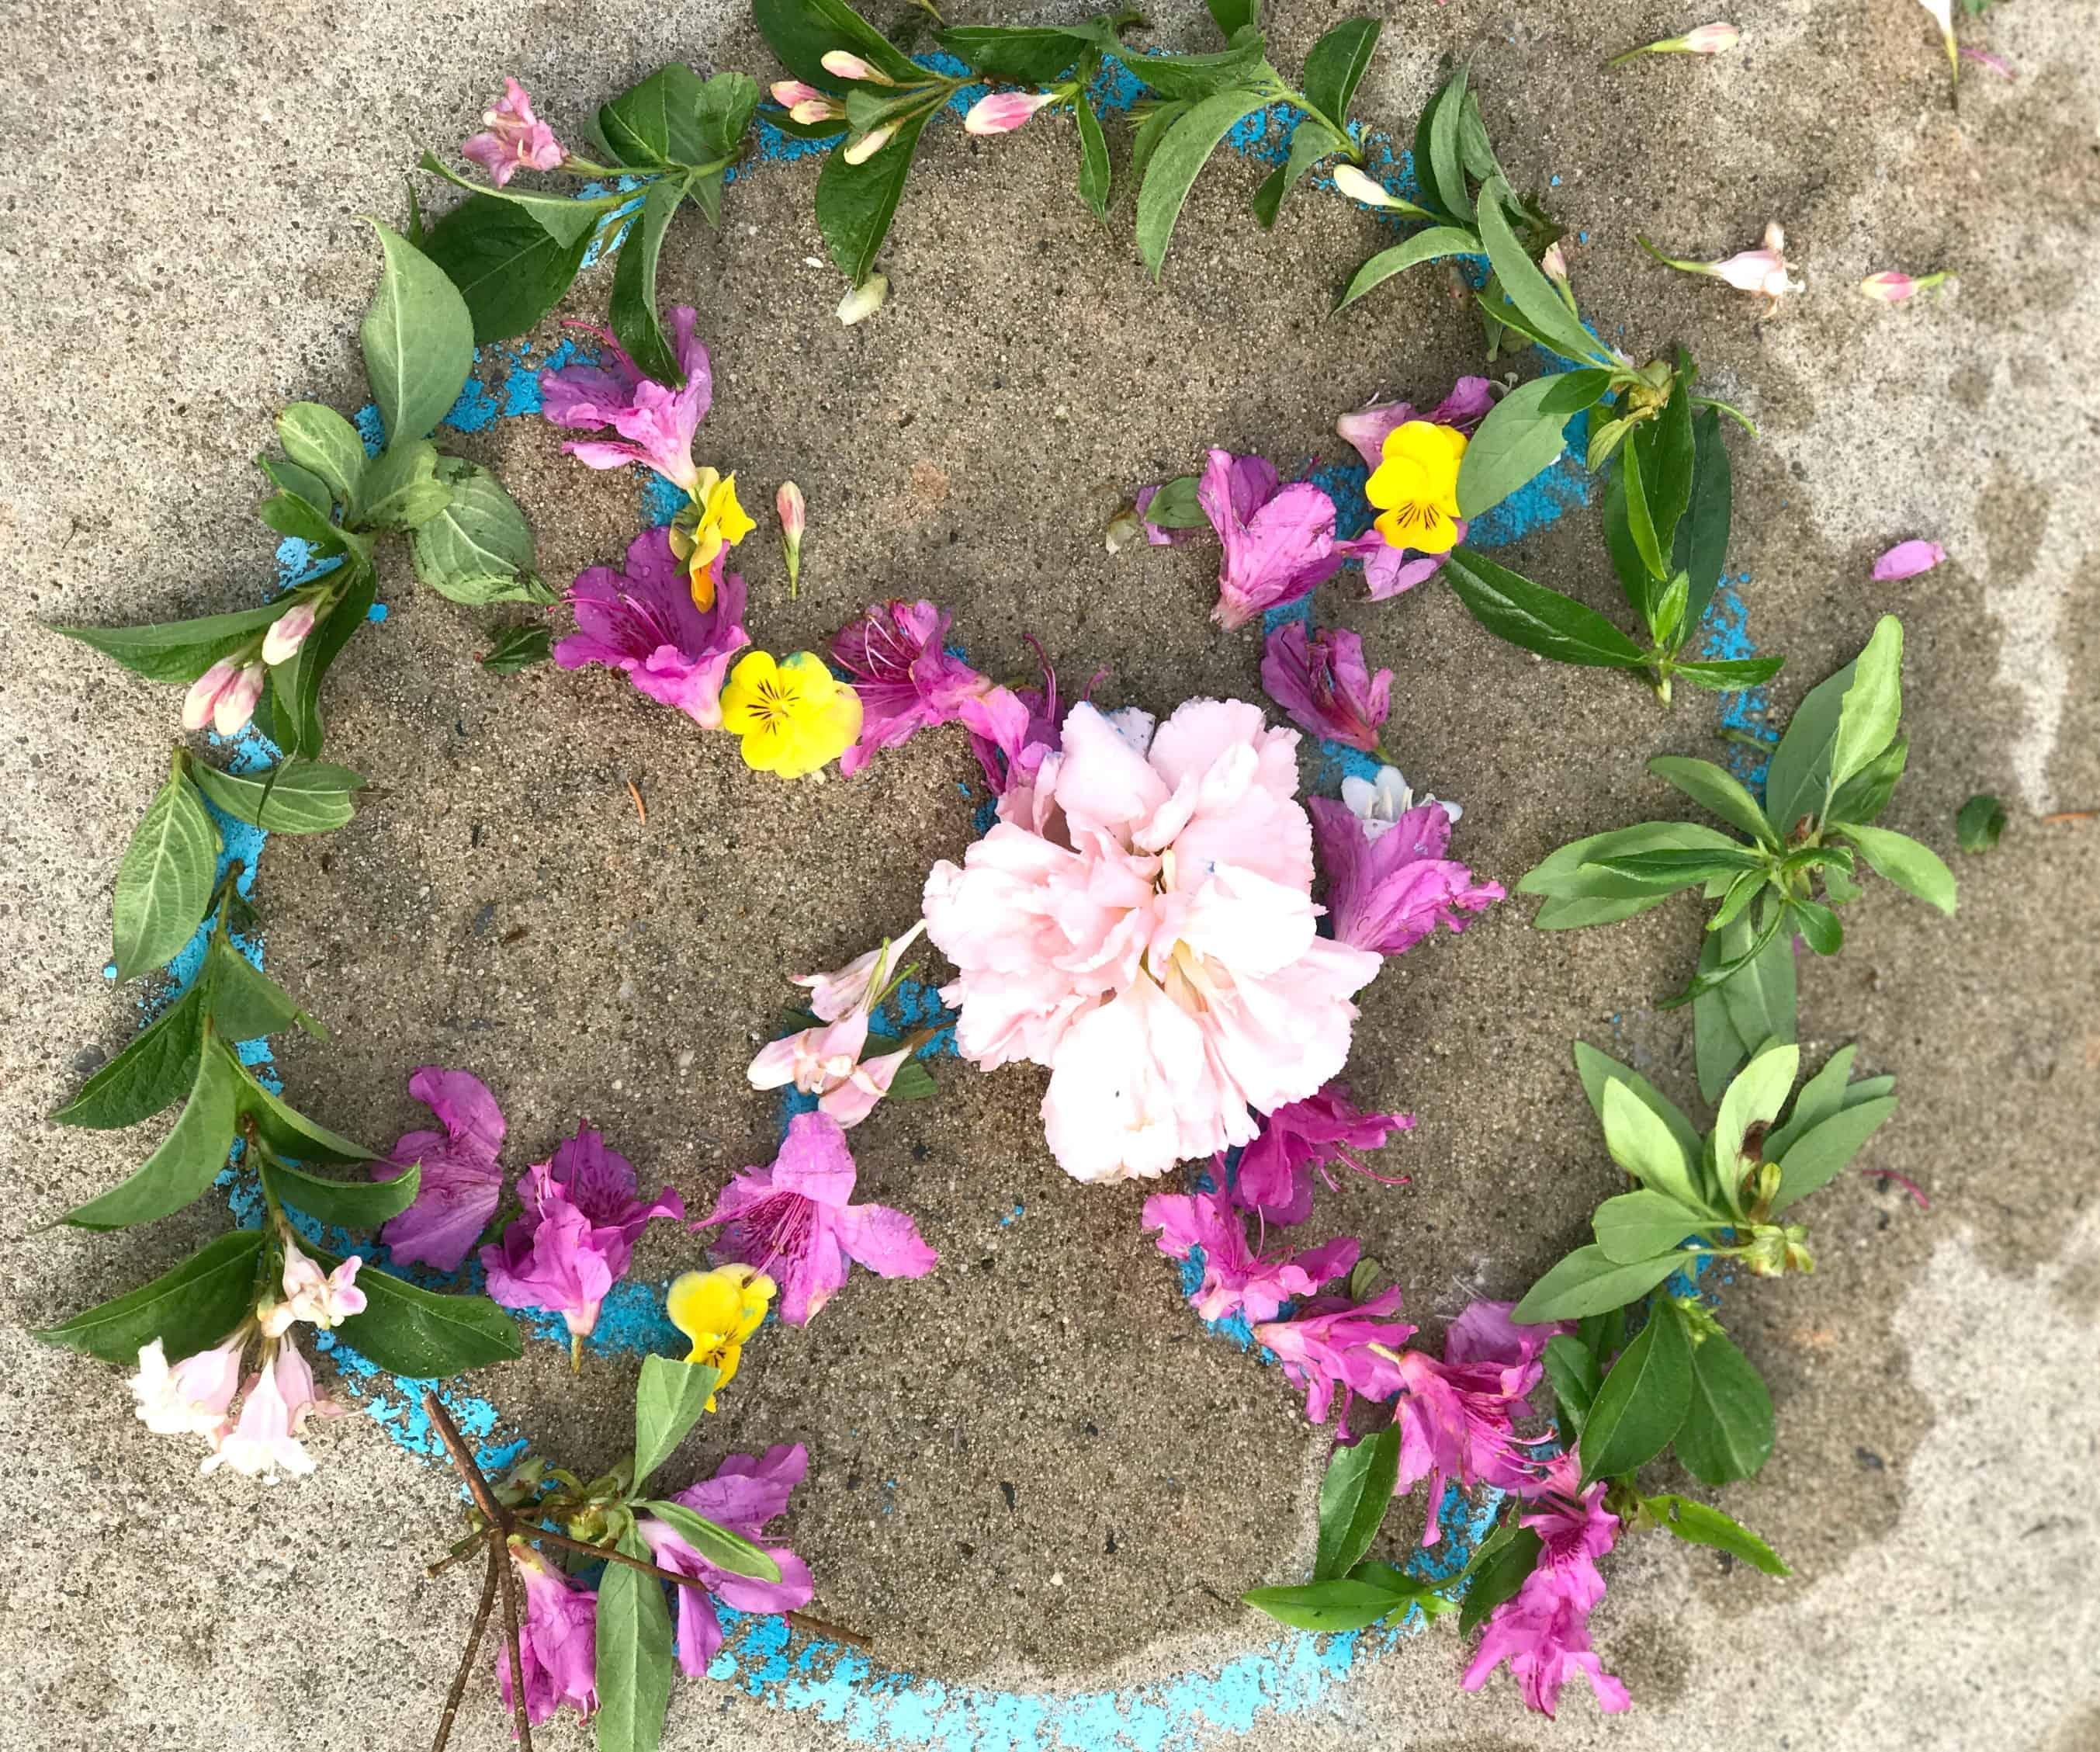 Flower Mandala Outdoor Process Art for Kids Views From a Step Stool